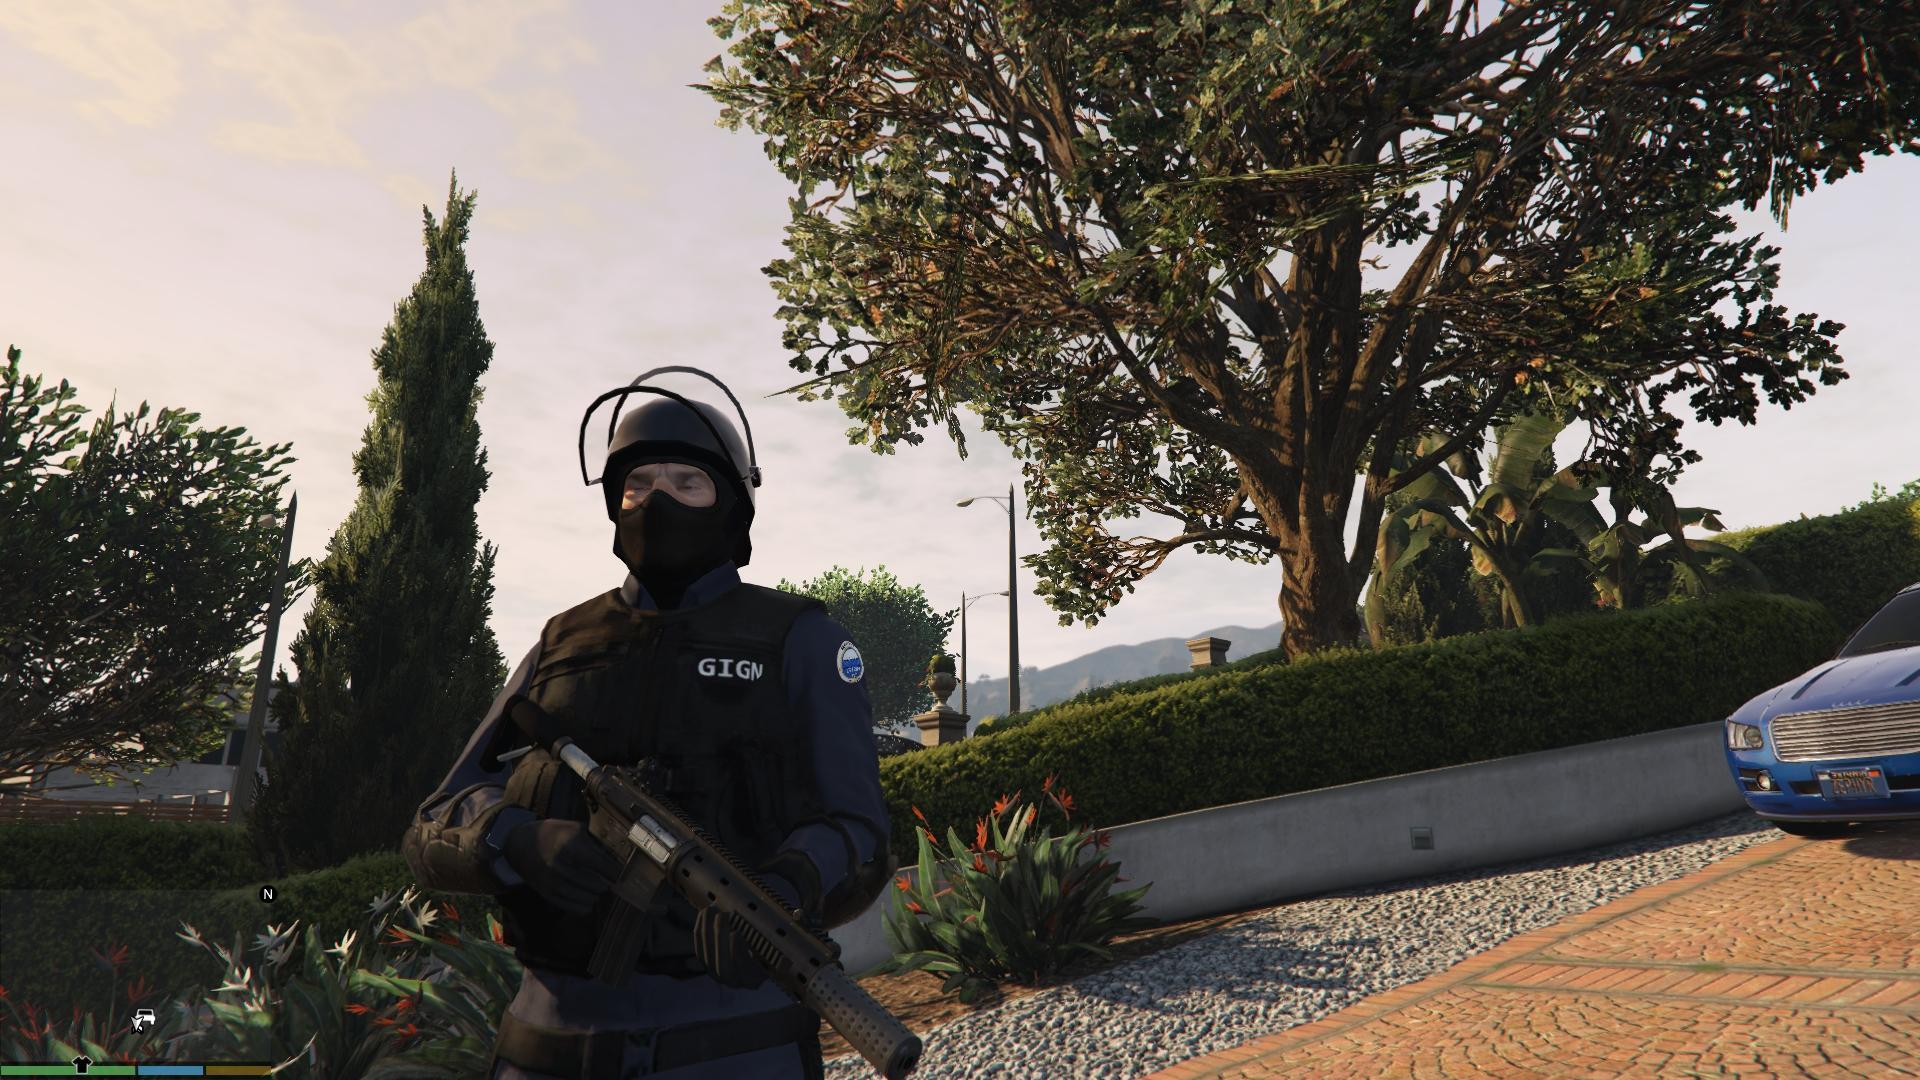 GIGN Uniforme + Casque (Remplace SWAT) - GTA5-Mods.com